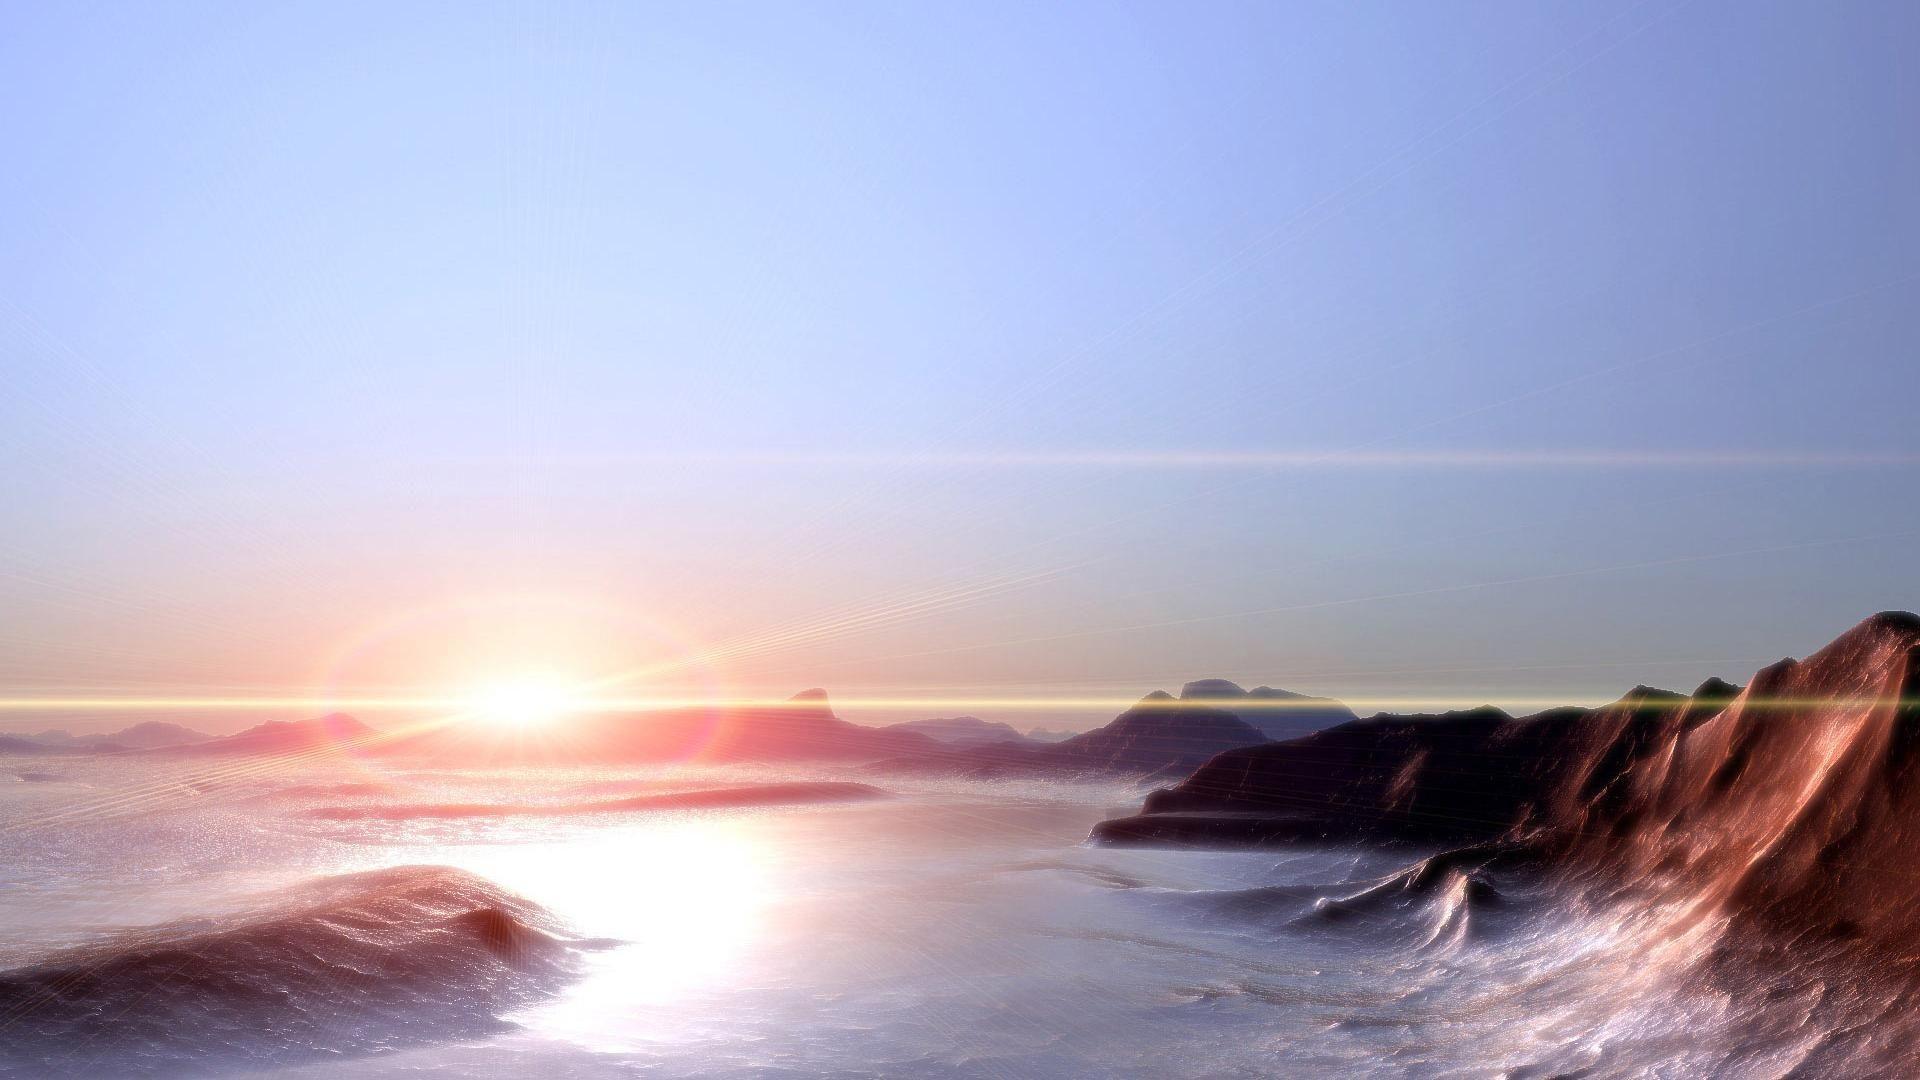 Free Fall Widescreen Wallpaper Beautiful Scenery Backgrounds 183 ①